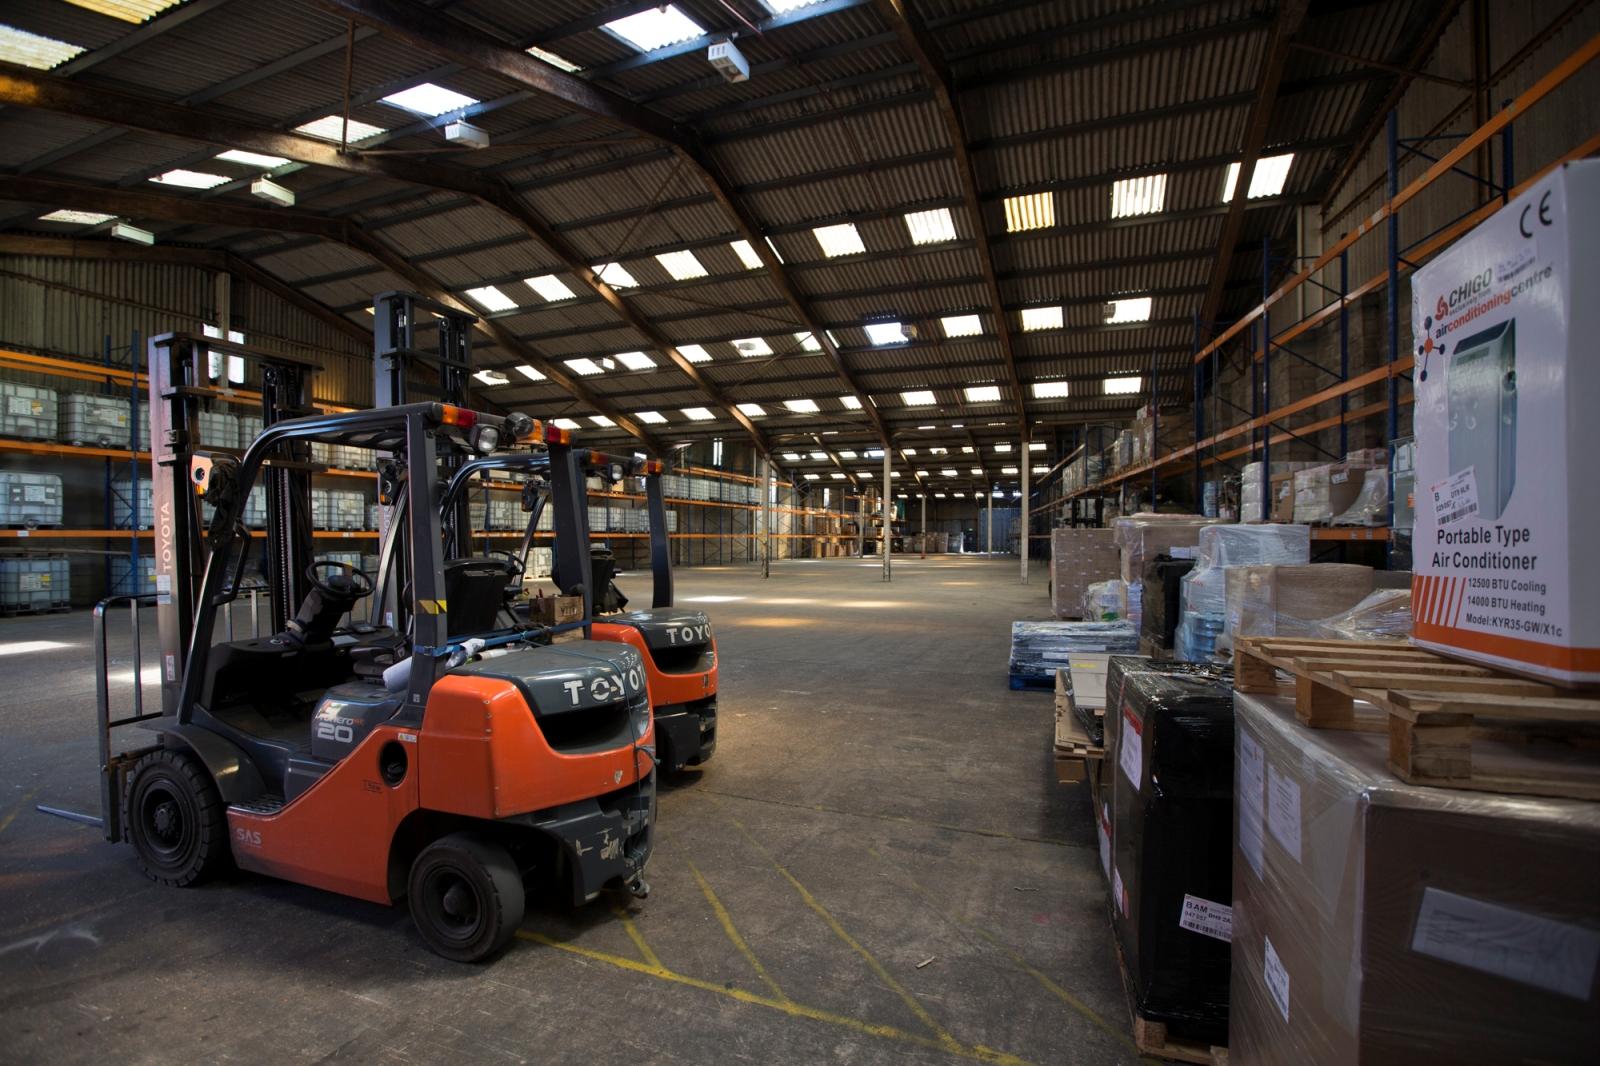 Grainstore Blandford Storage Offices Workshops To Rent